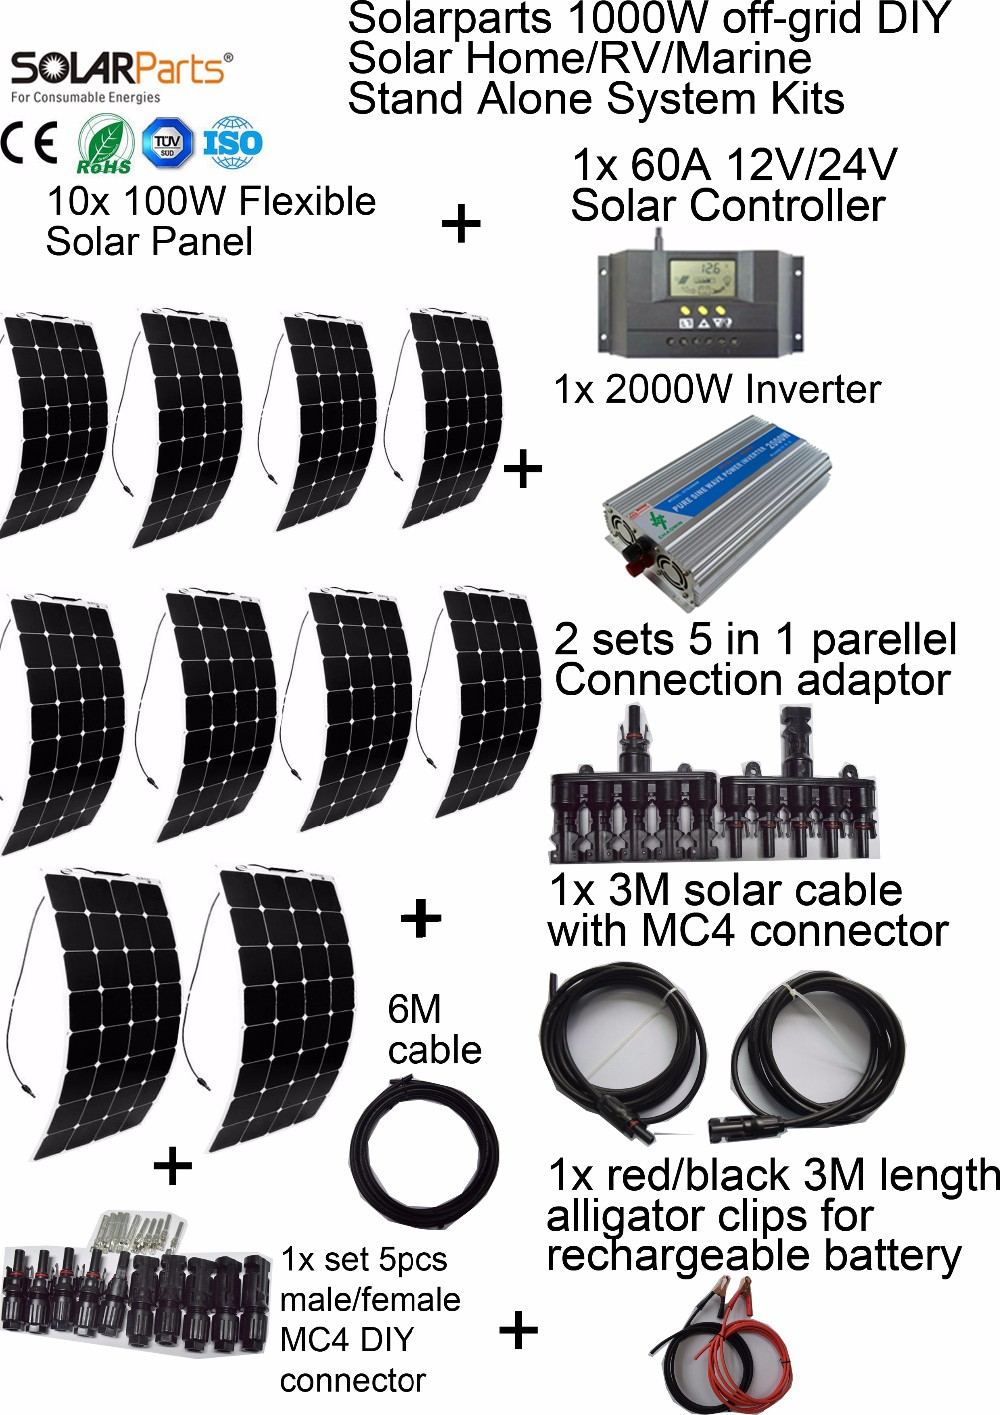 solarparts 1000w off